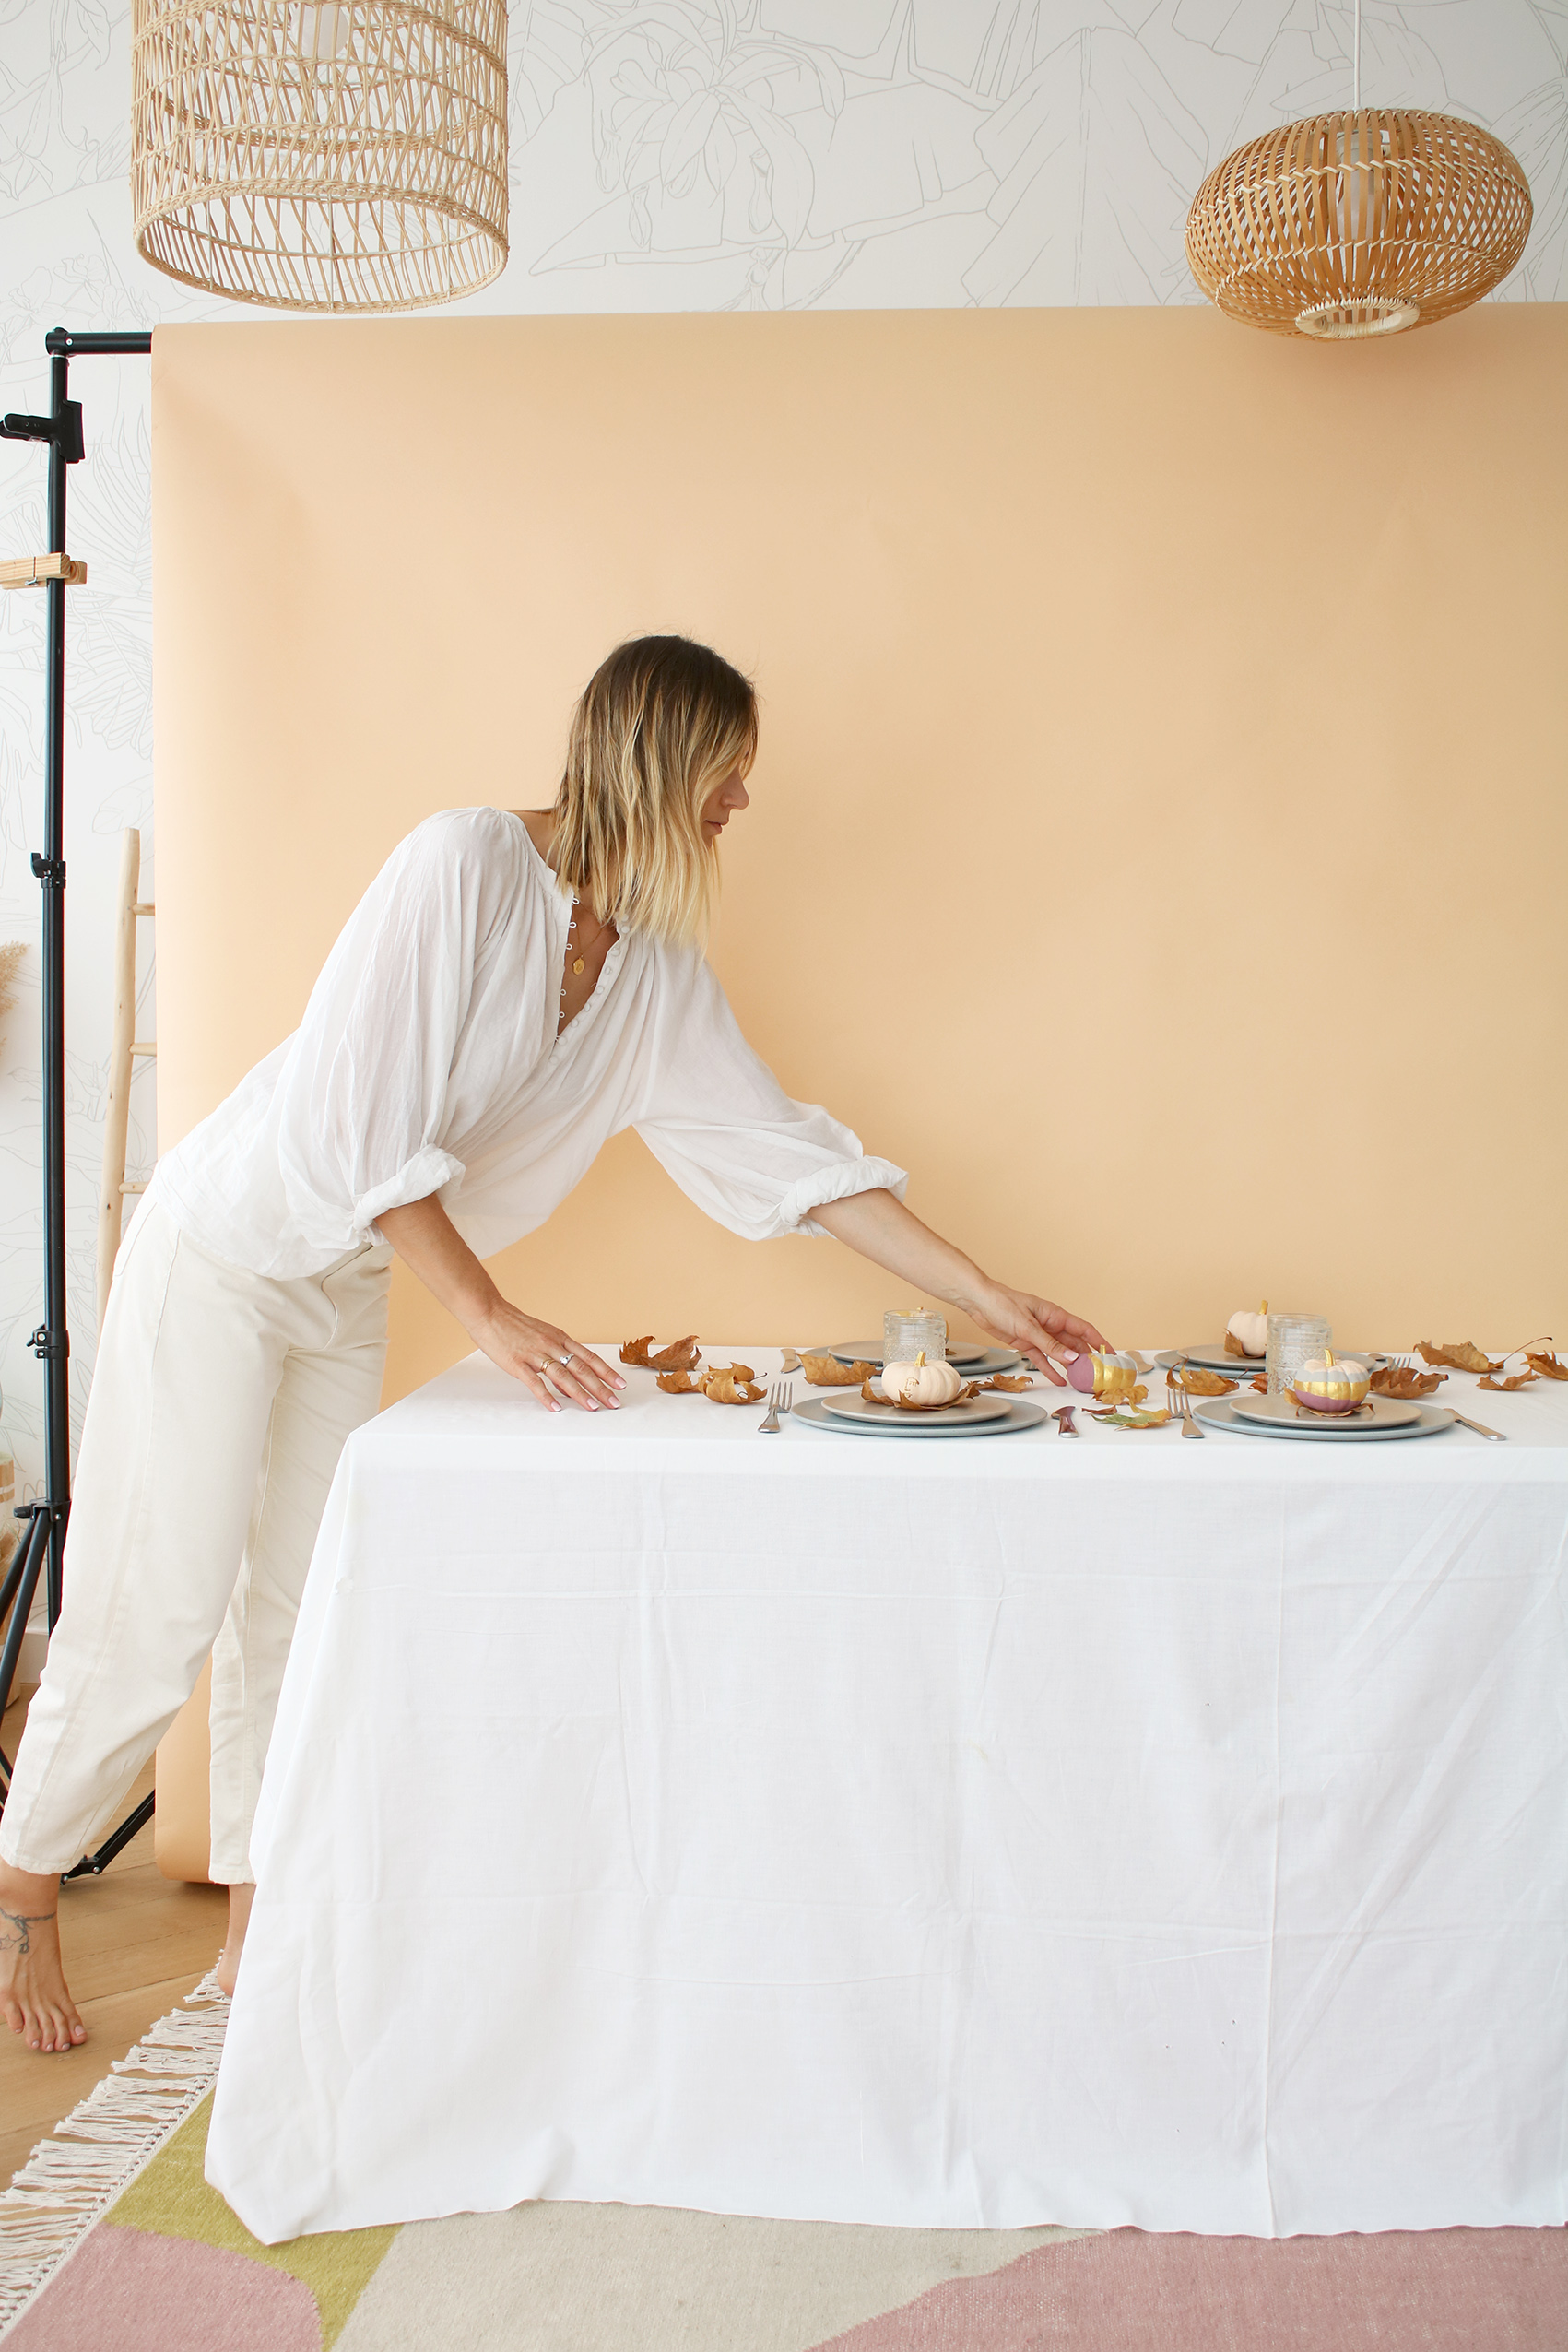 Alexandrine-influenceuse-DIY-atelier-artlex-lyon